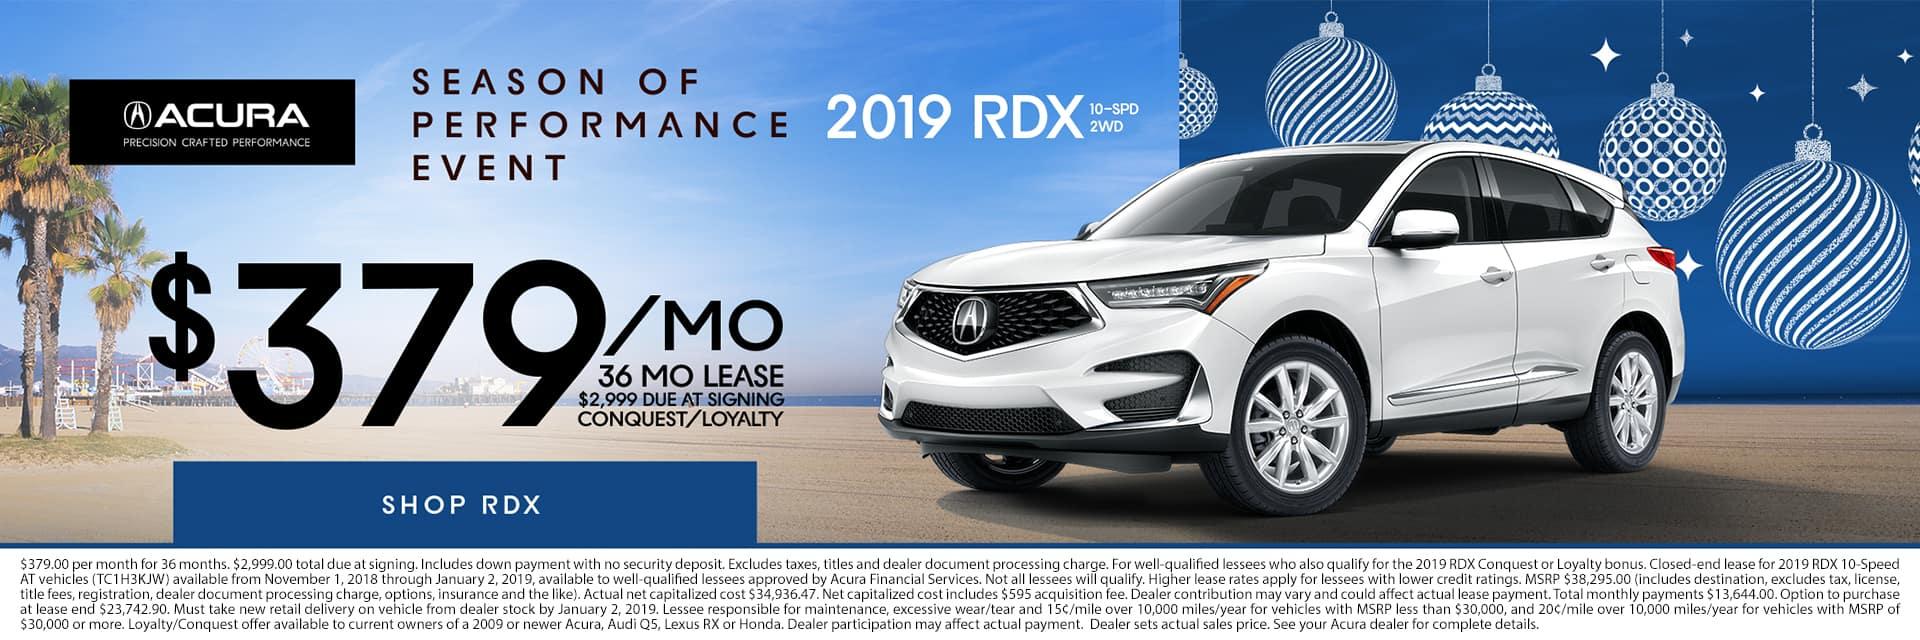 2019 RDX Season of Performance